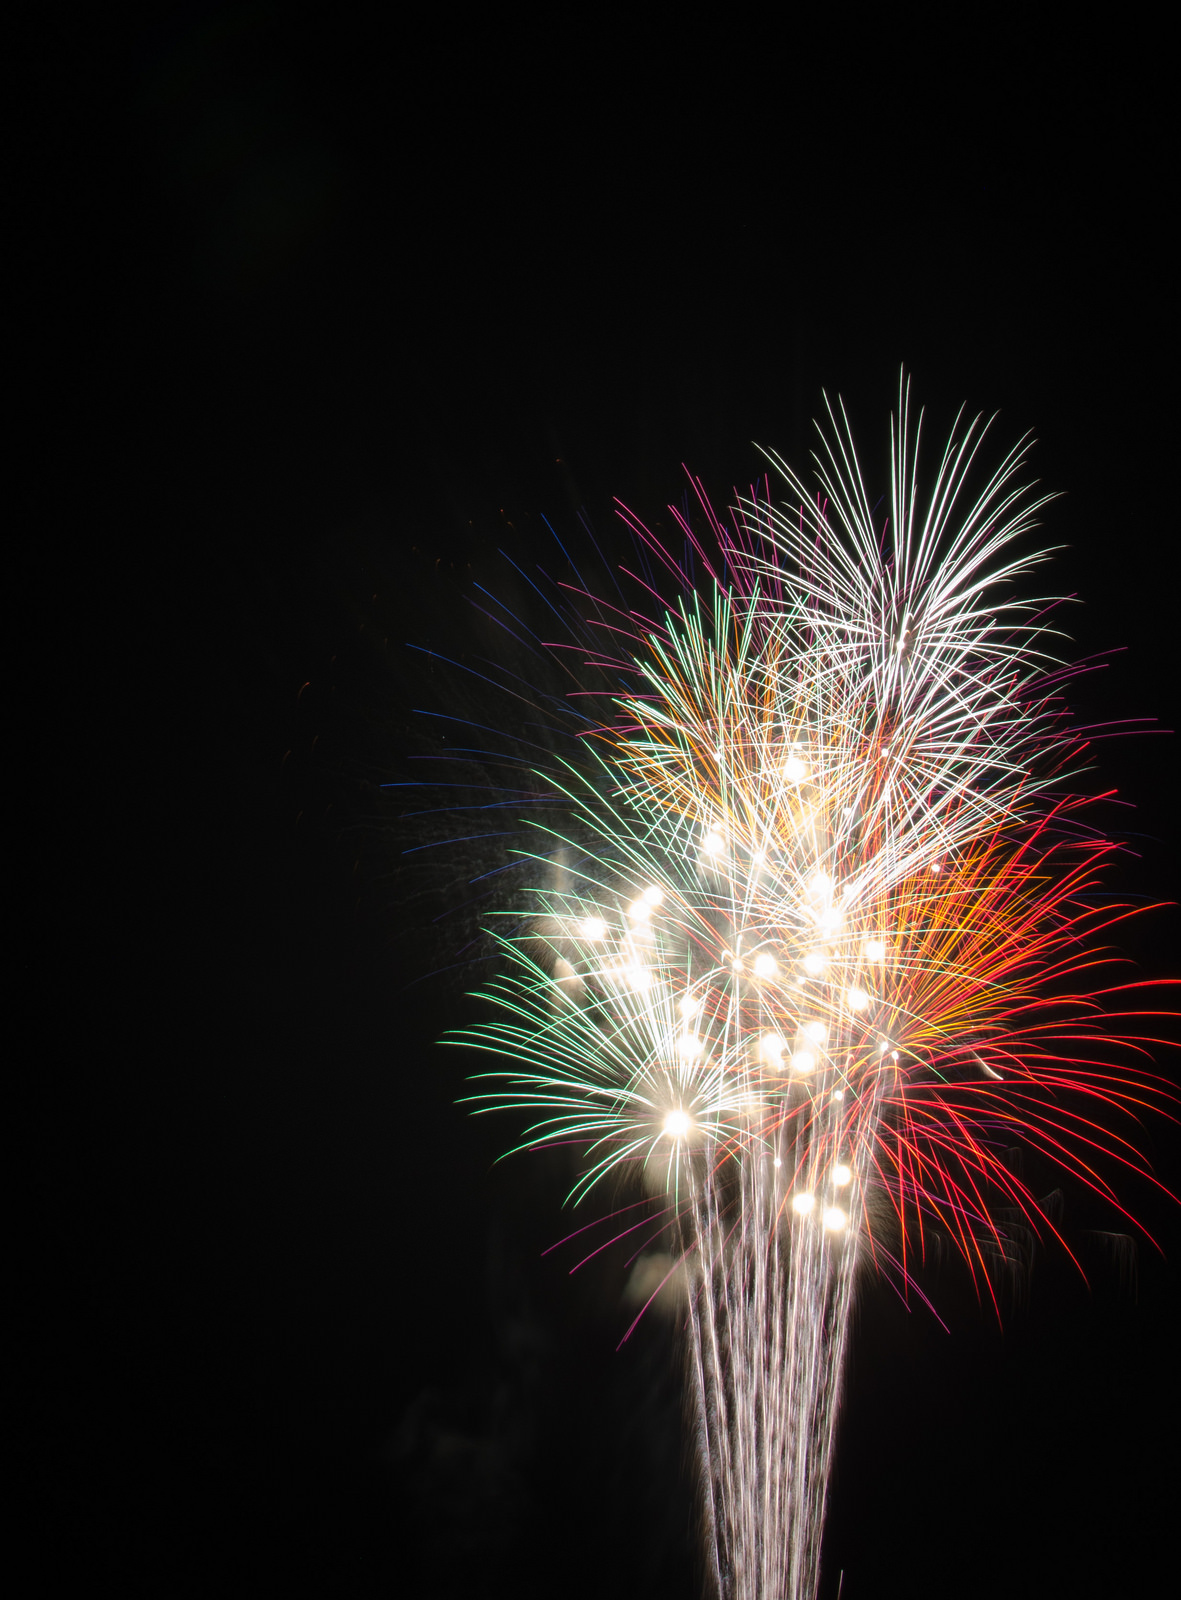 How to Photograph Summer Fireworks NIKON D5100 20140701 0664